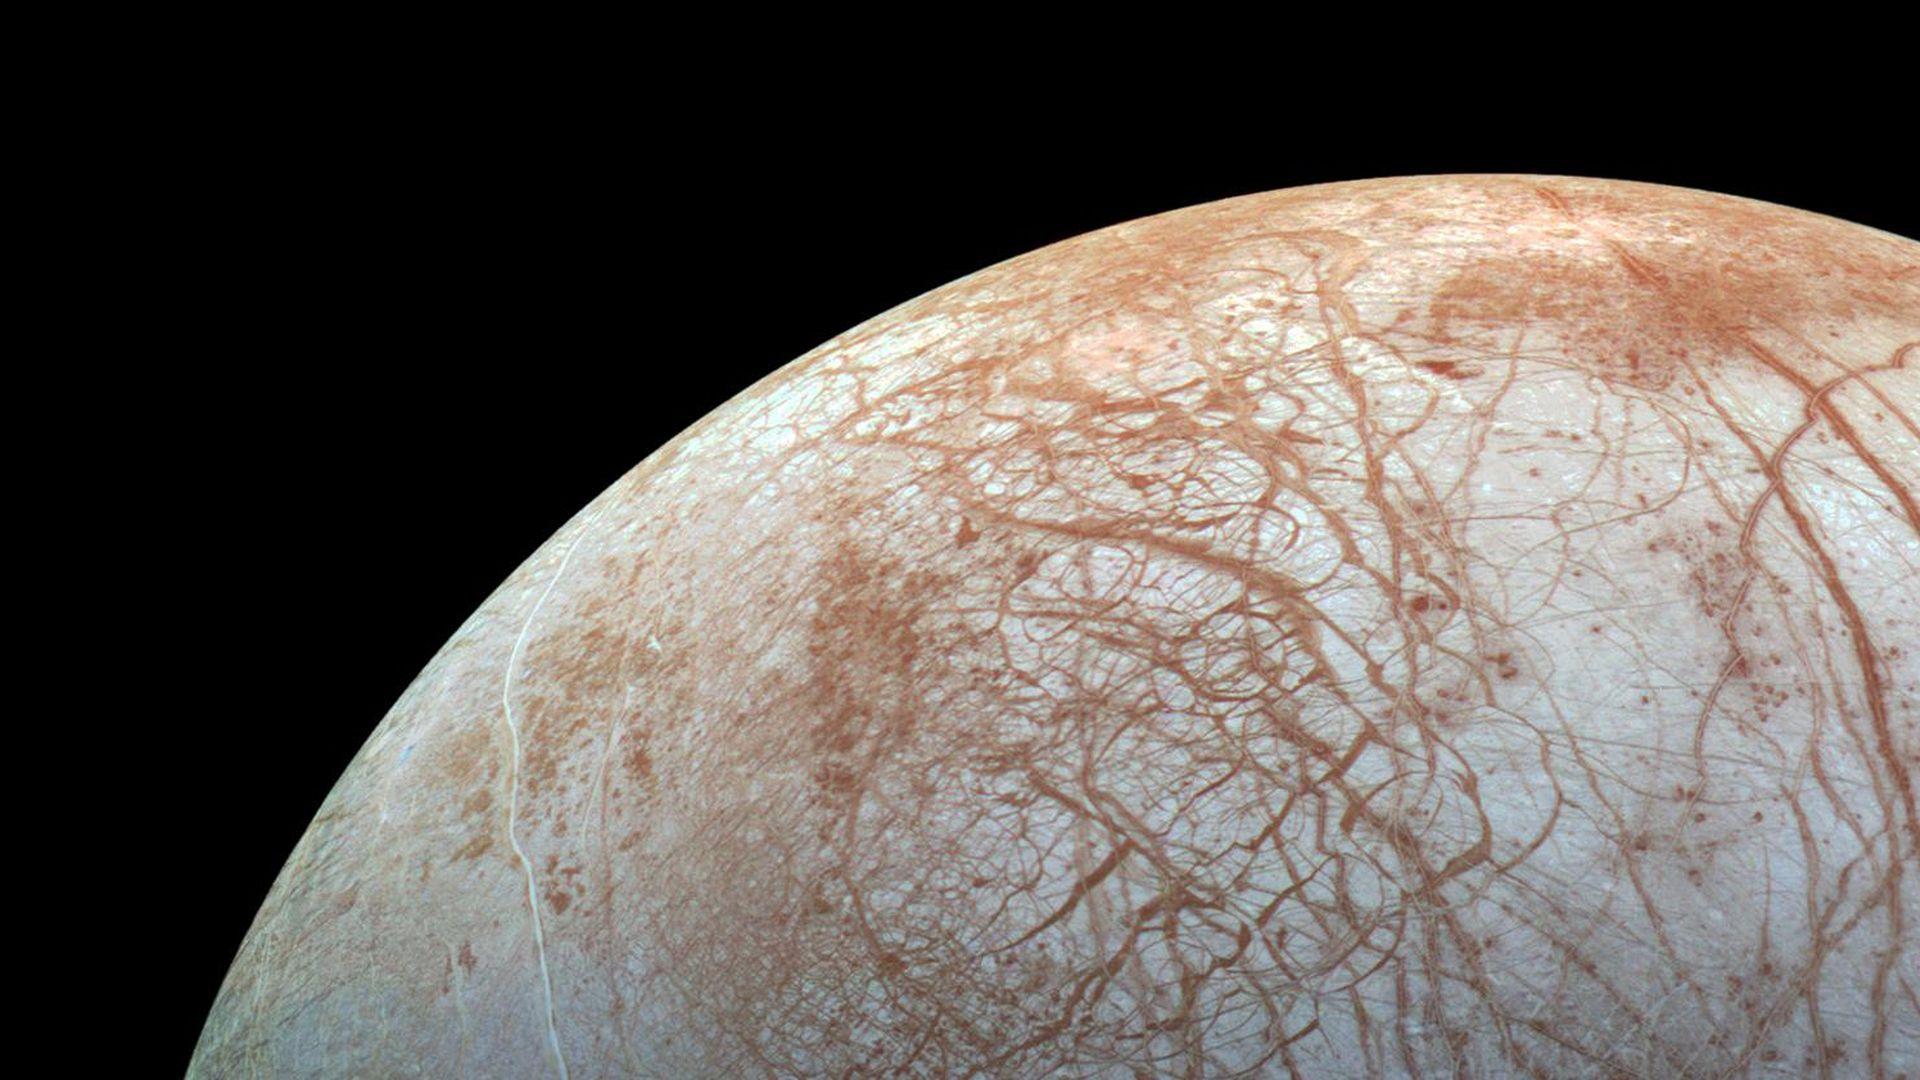 The secrets hiding under Europa's ice